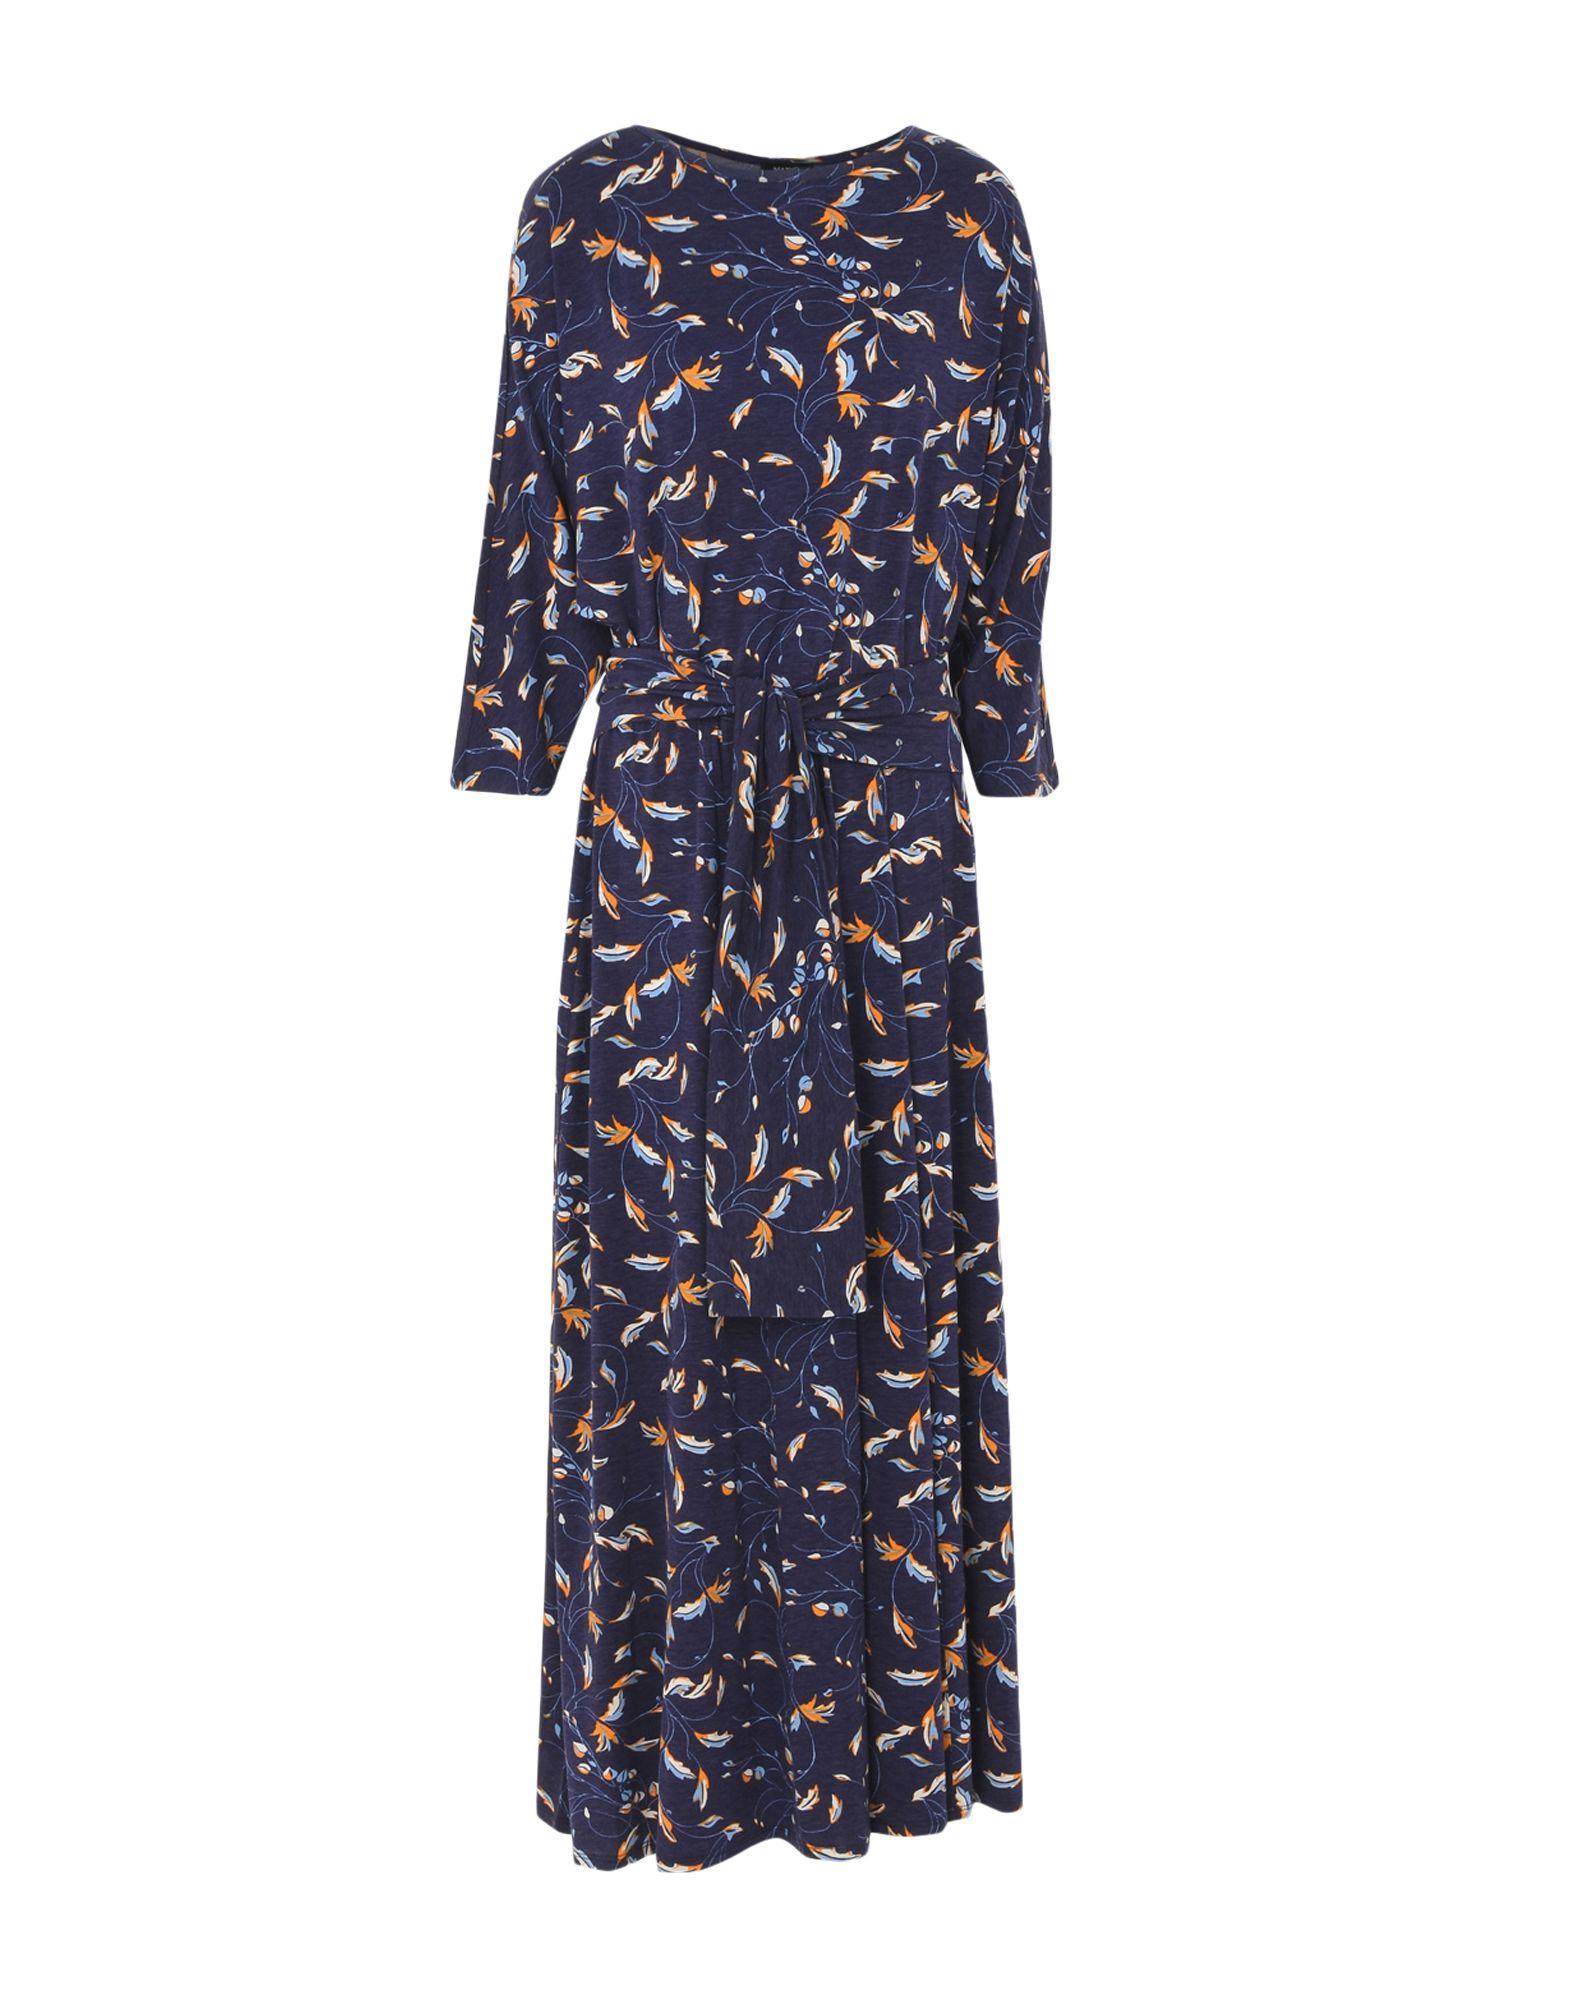 MAX & CO. Платье длиной 3/4 co 231t 3